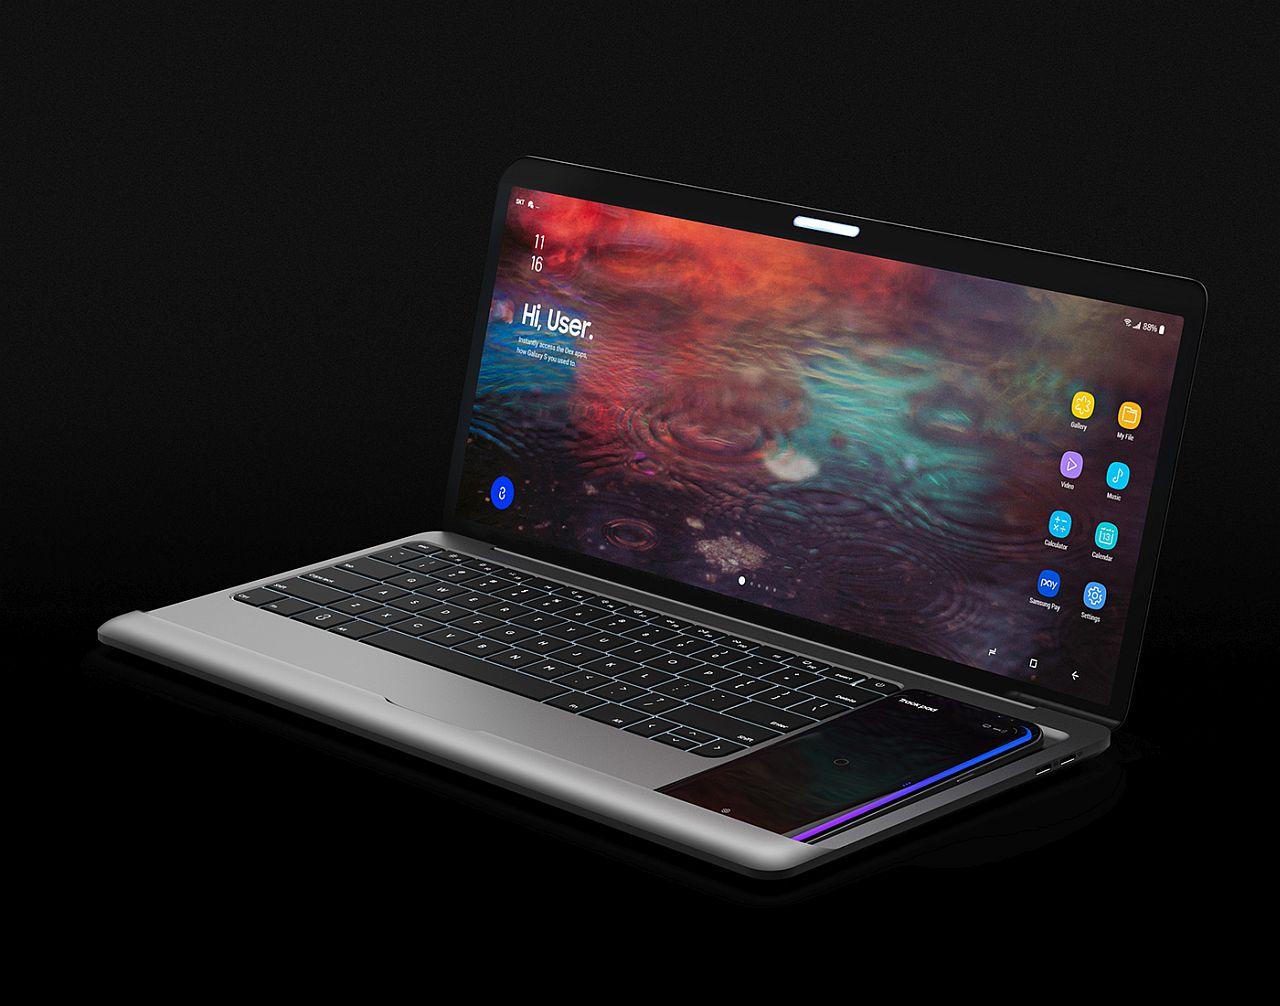 Ноутбук ASUS X540SA-XX020T 90NB0B31-M00730 (Intel Pentium N3700 1.6 GHz/2048Mb/500Gb/DVD-RW/Intel HD Graphics/Wi-Fi/Cam/15.6/1366x768/Windows 10)